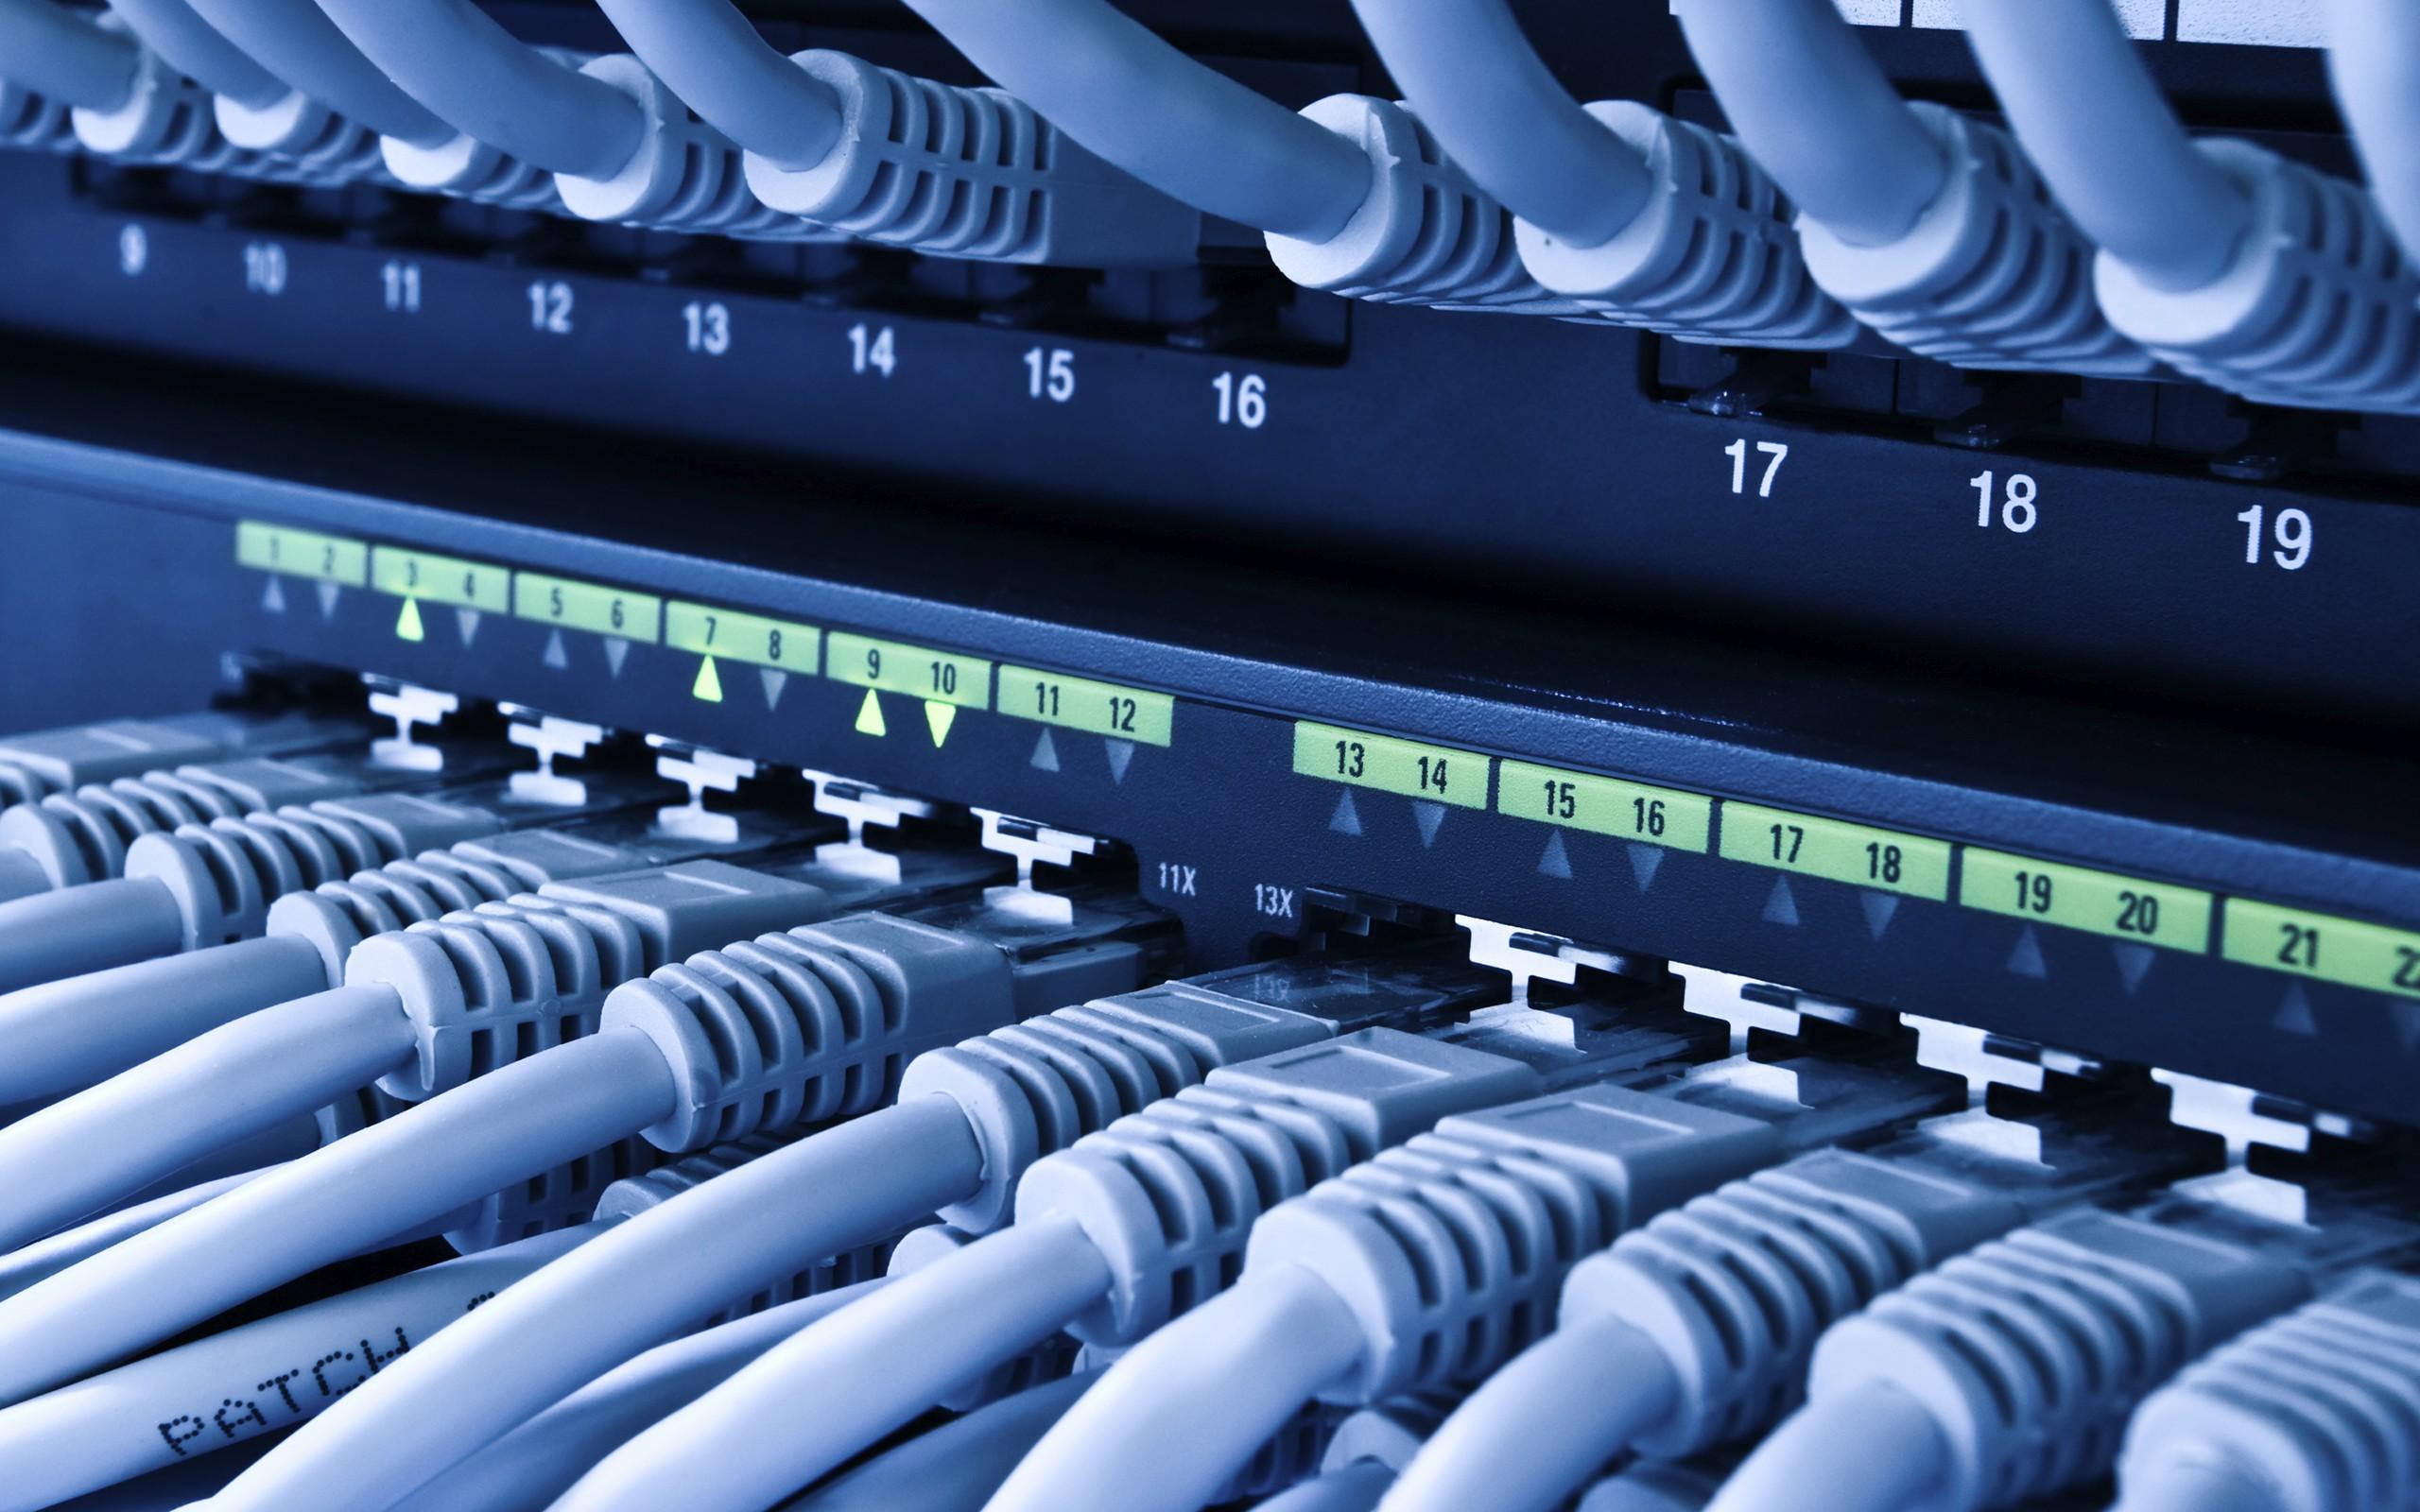 General 2560x1600 network computer server ethernet technology